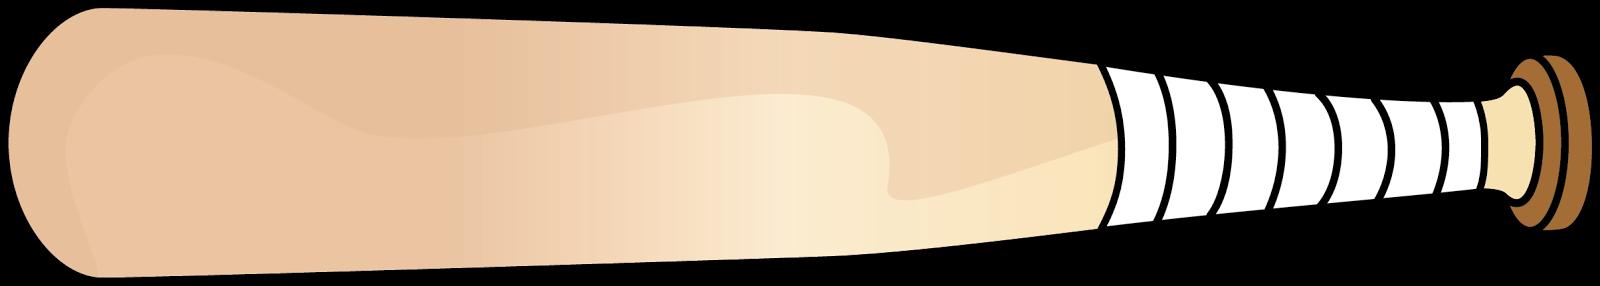 Free Baseball Bat Clip Art Pictures.